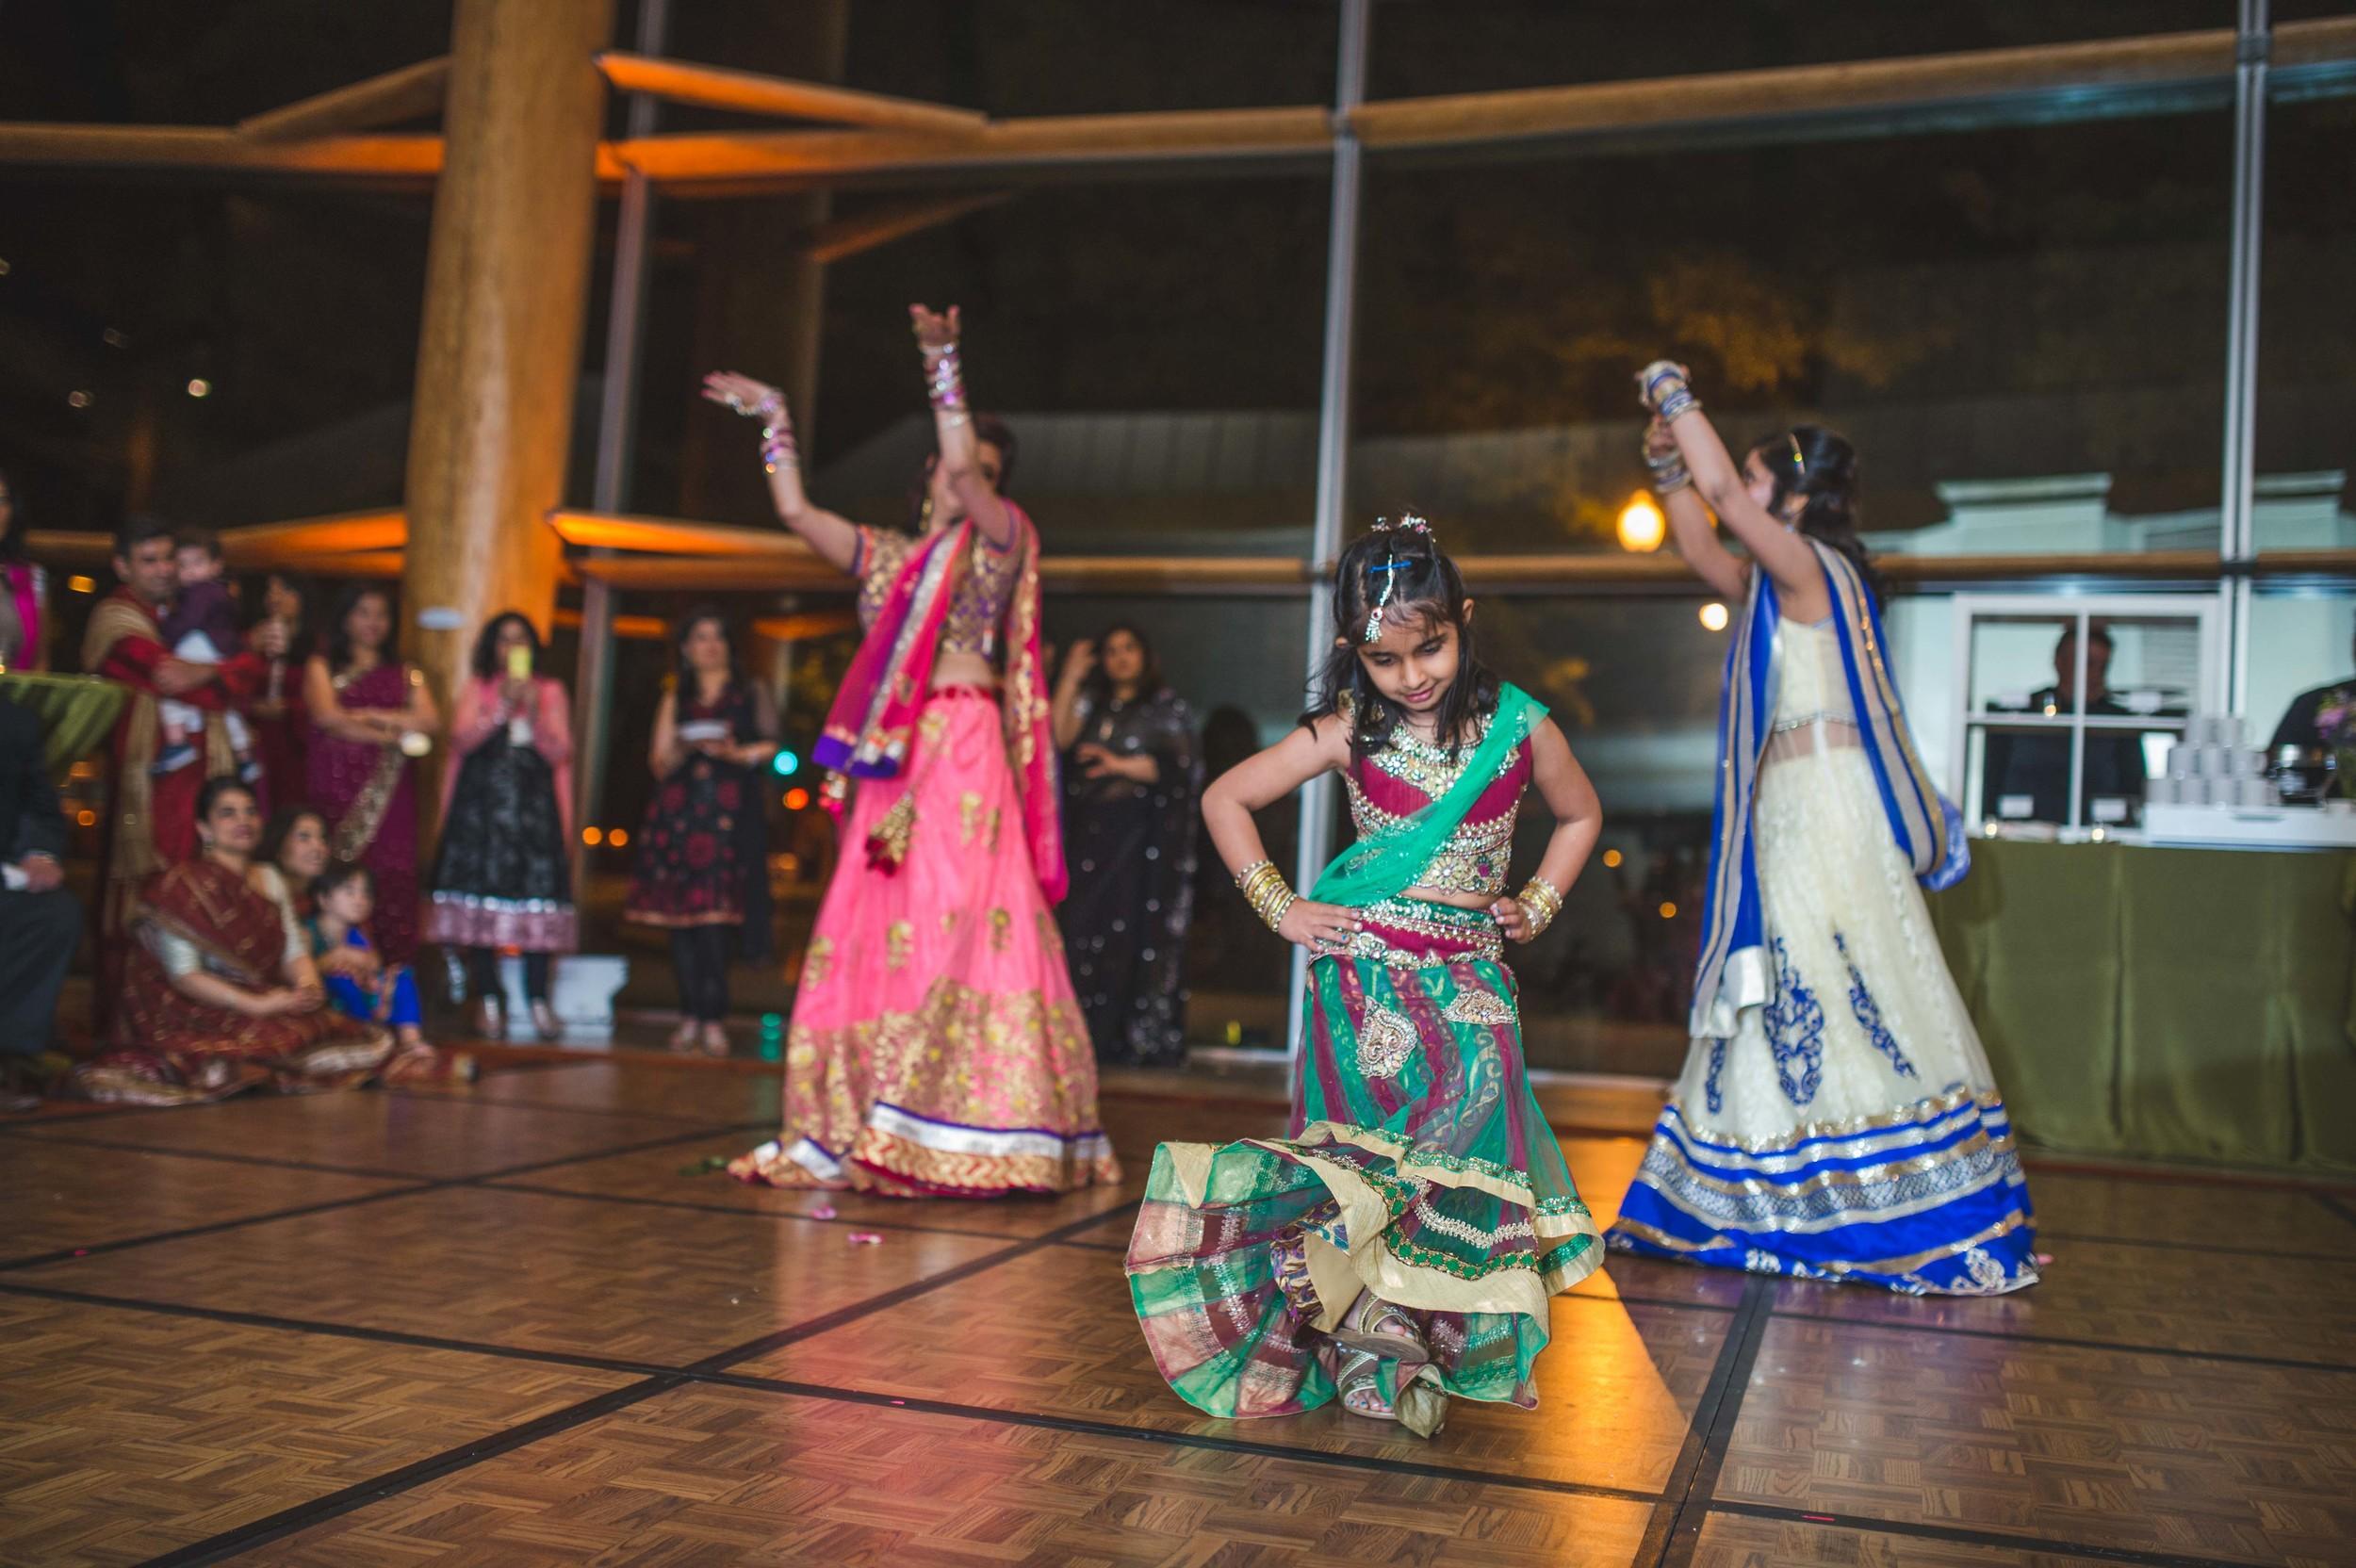 Indian Pre-wedding  at Arena Stage Washington DC by Mantas Kubilinskas-27.jpg